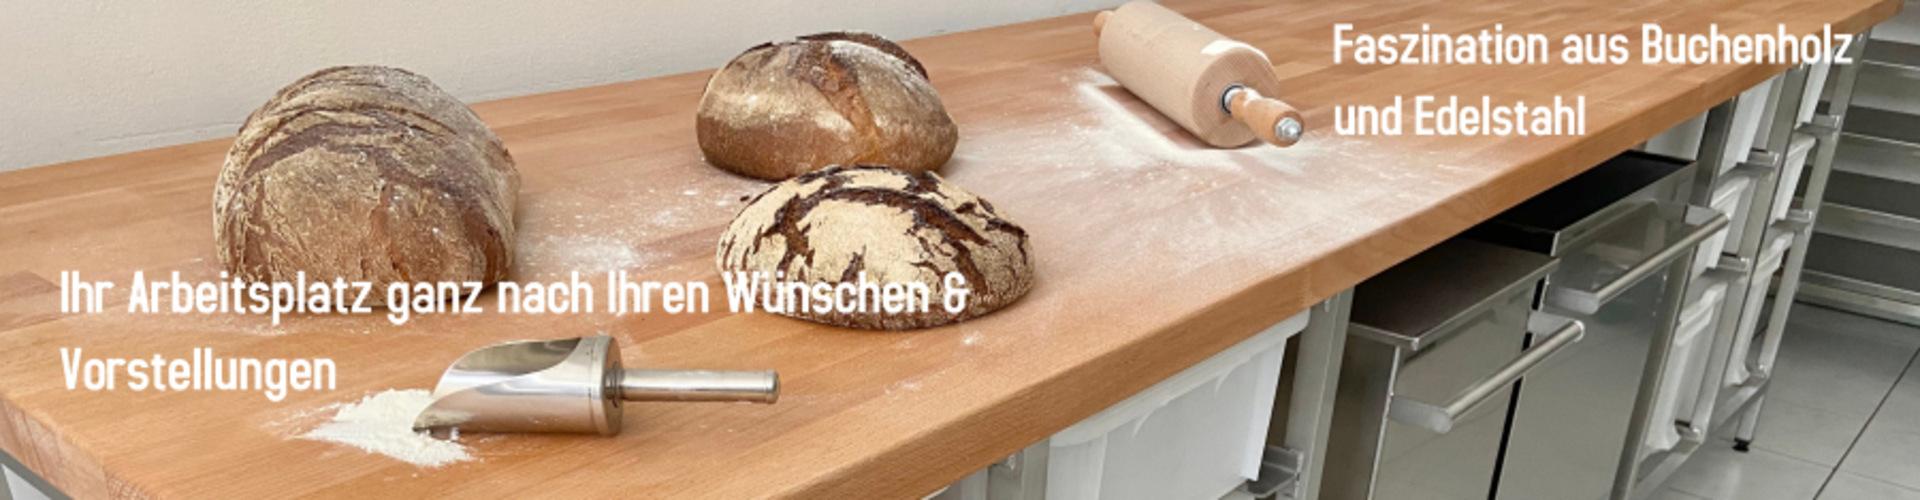 MBM Lambeck Buchenholztische aus Edelstahl